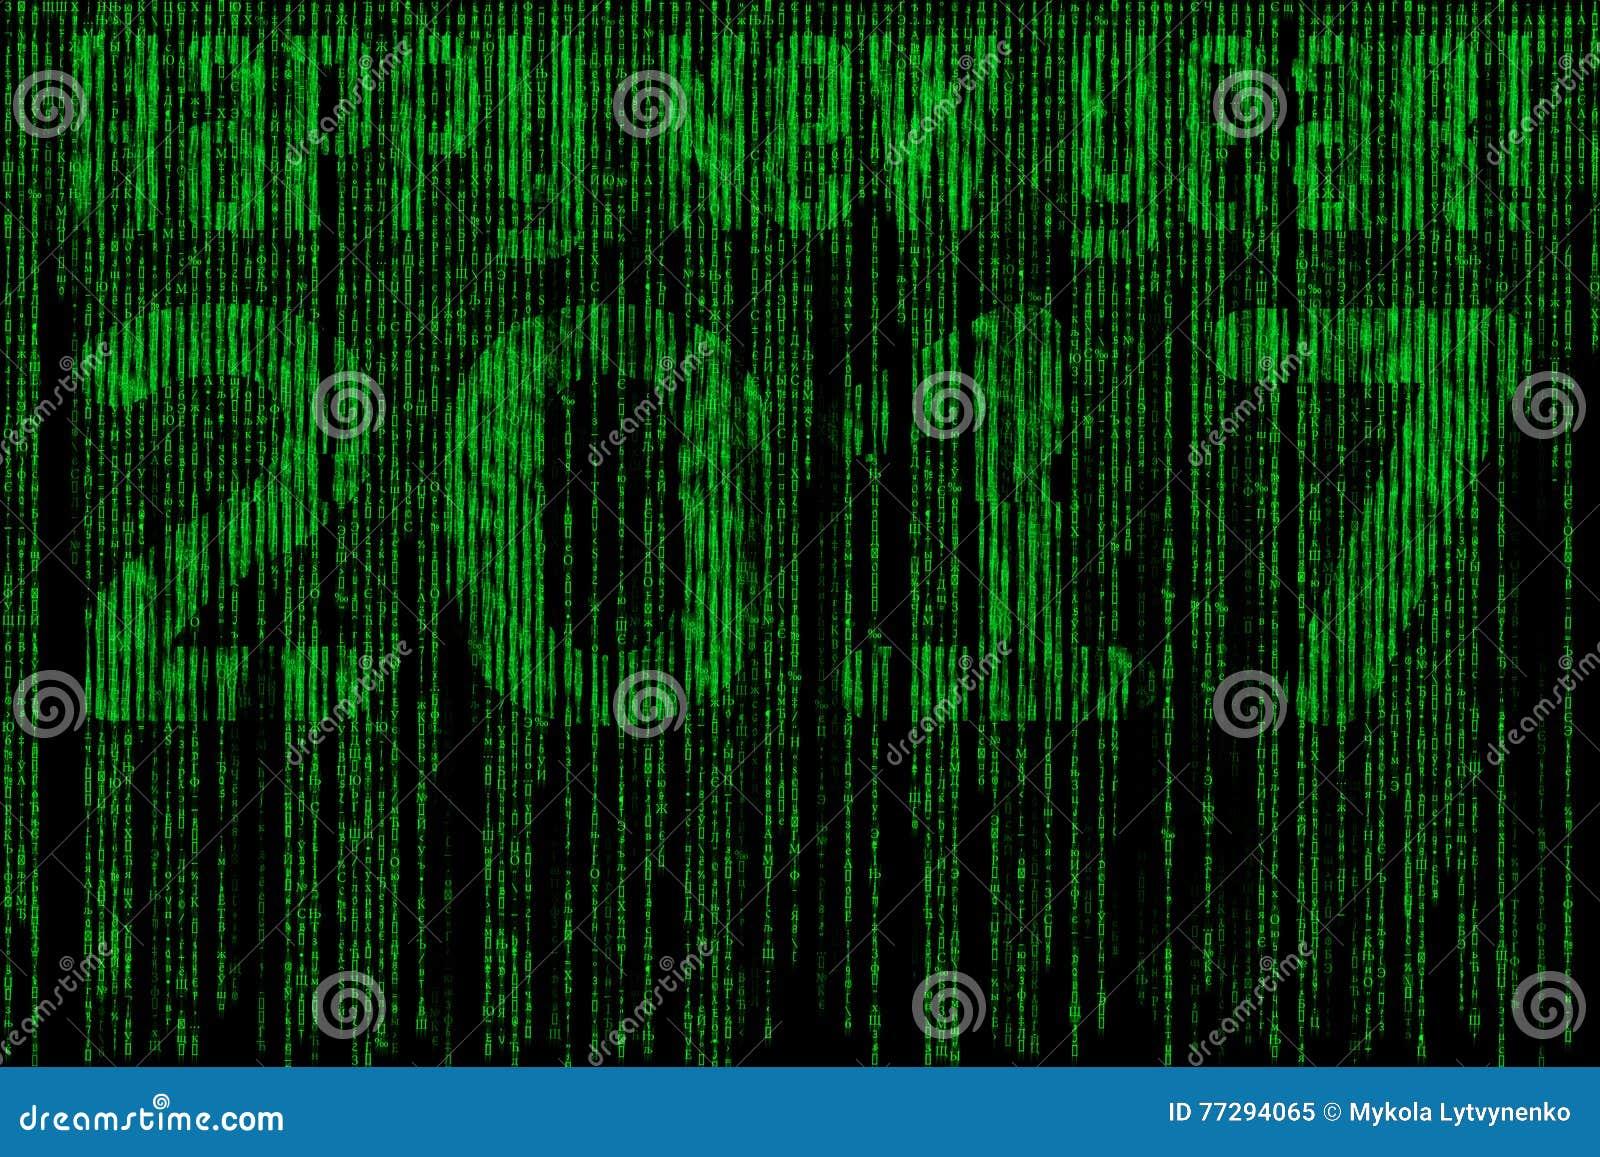 Happy new year matrix 2017 stock illustration illustration of happy new year matrix 2017 spiritdancerdesigns Choice Image